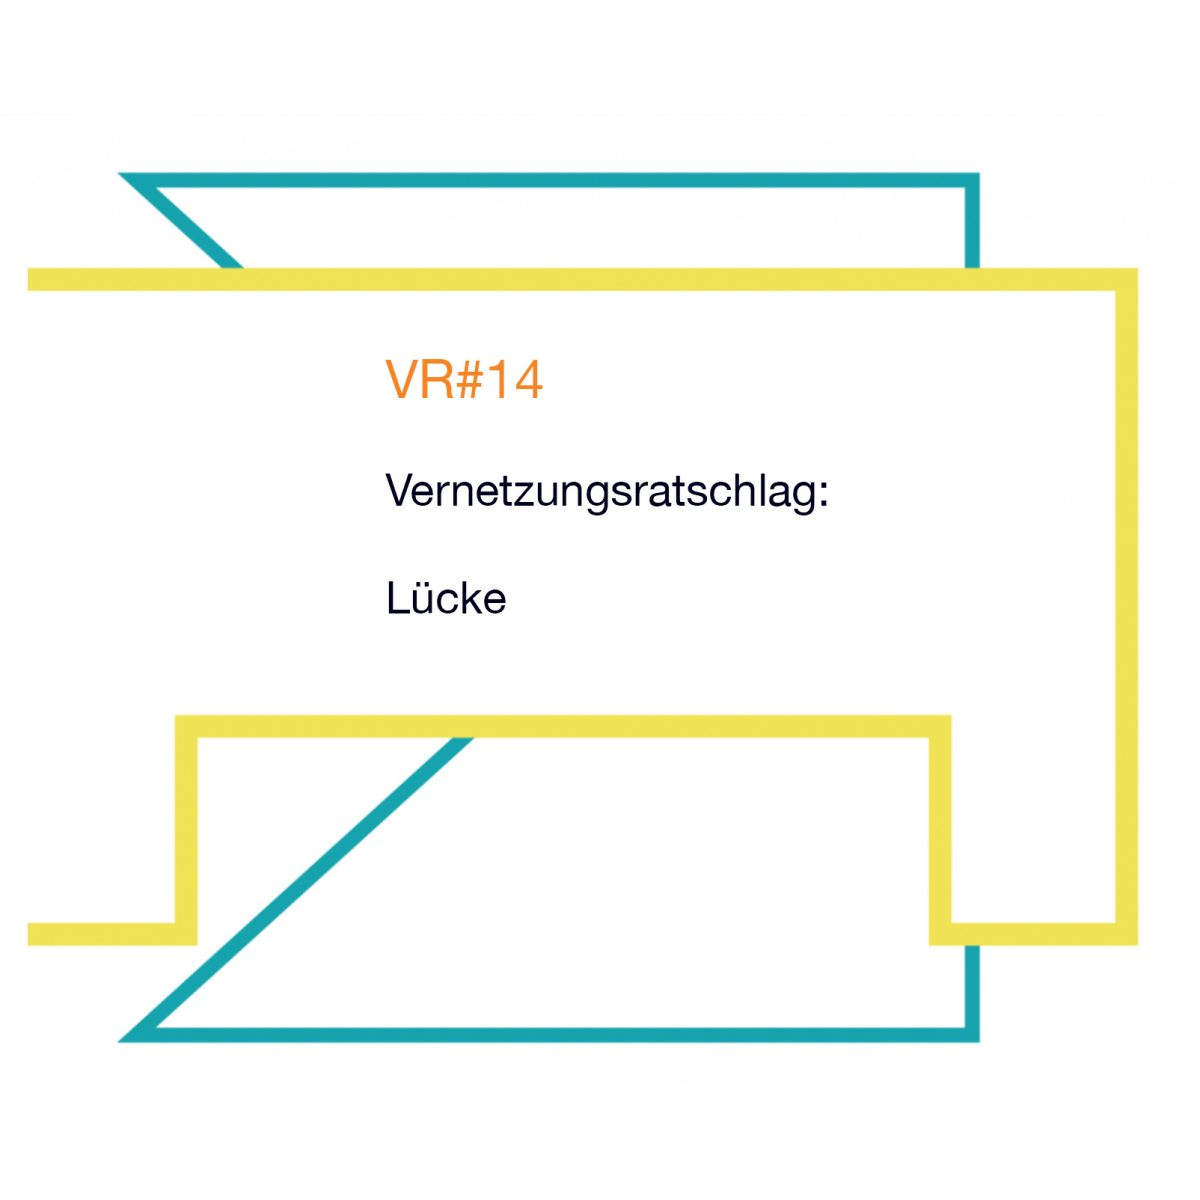 VR#14 Lücke